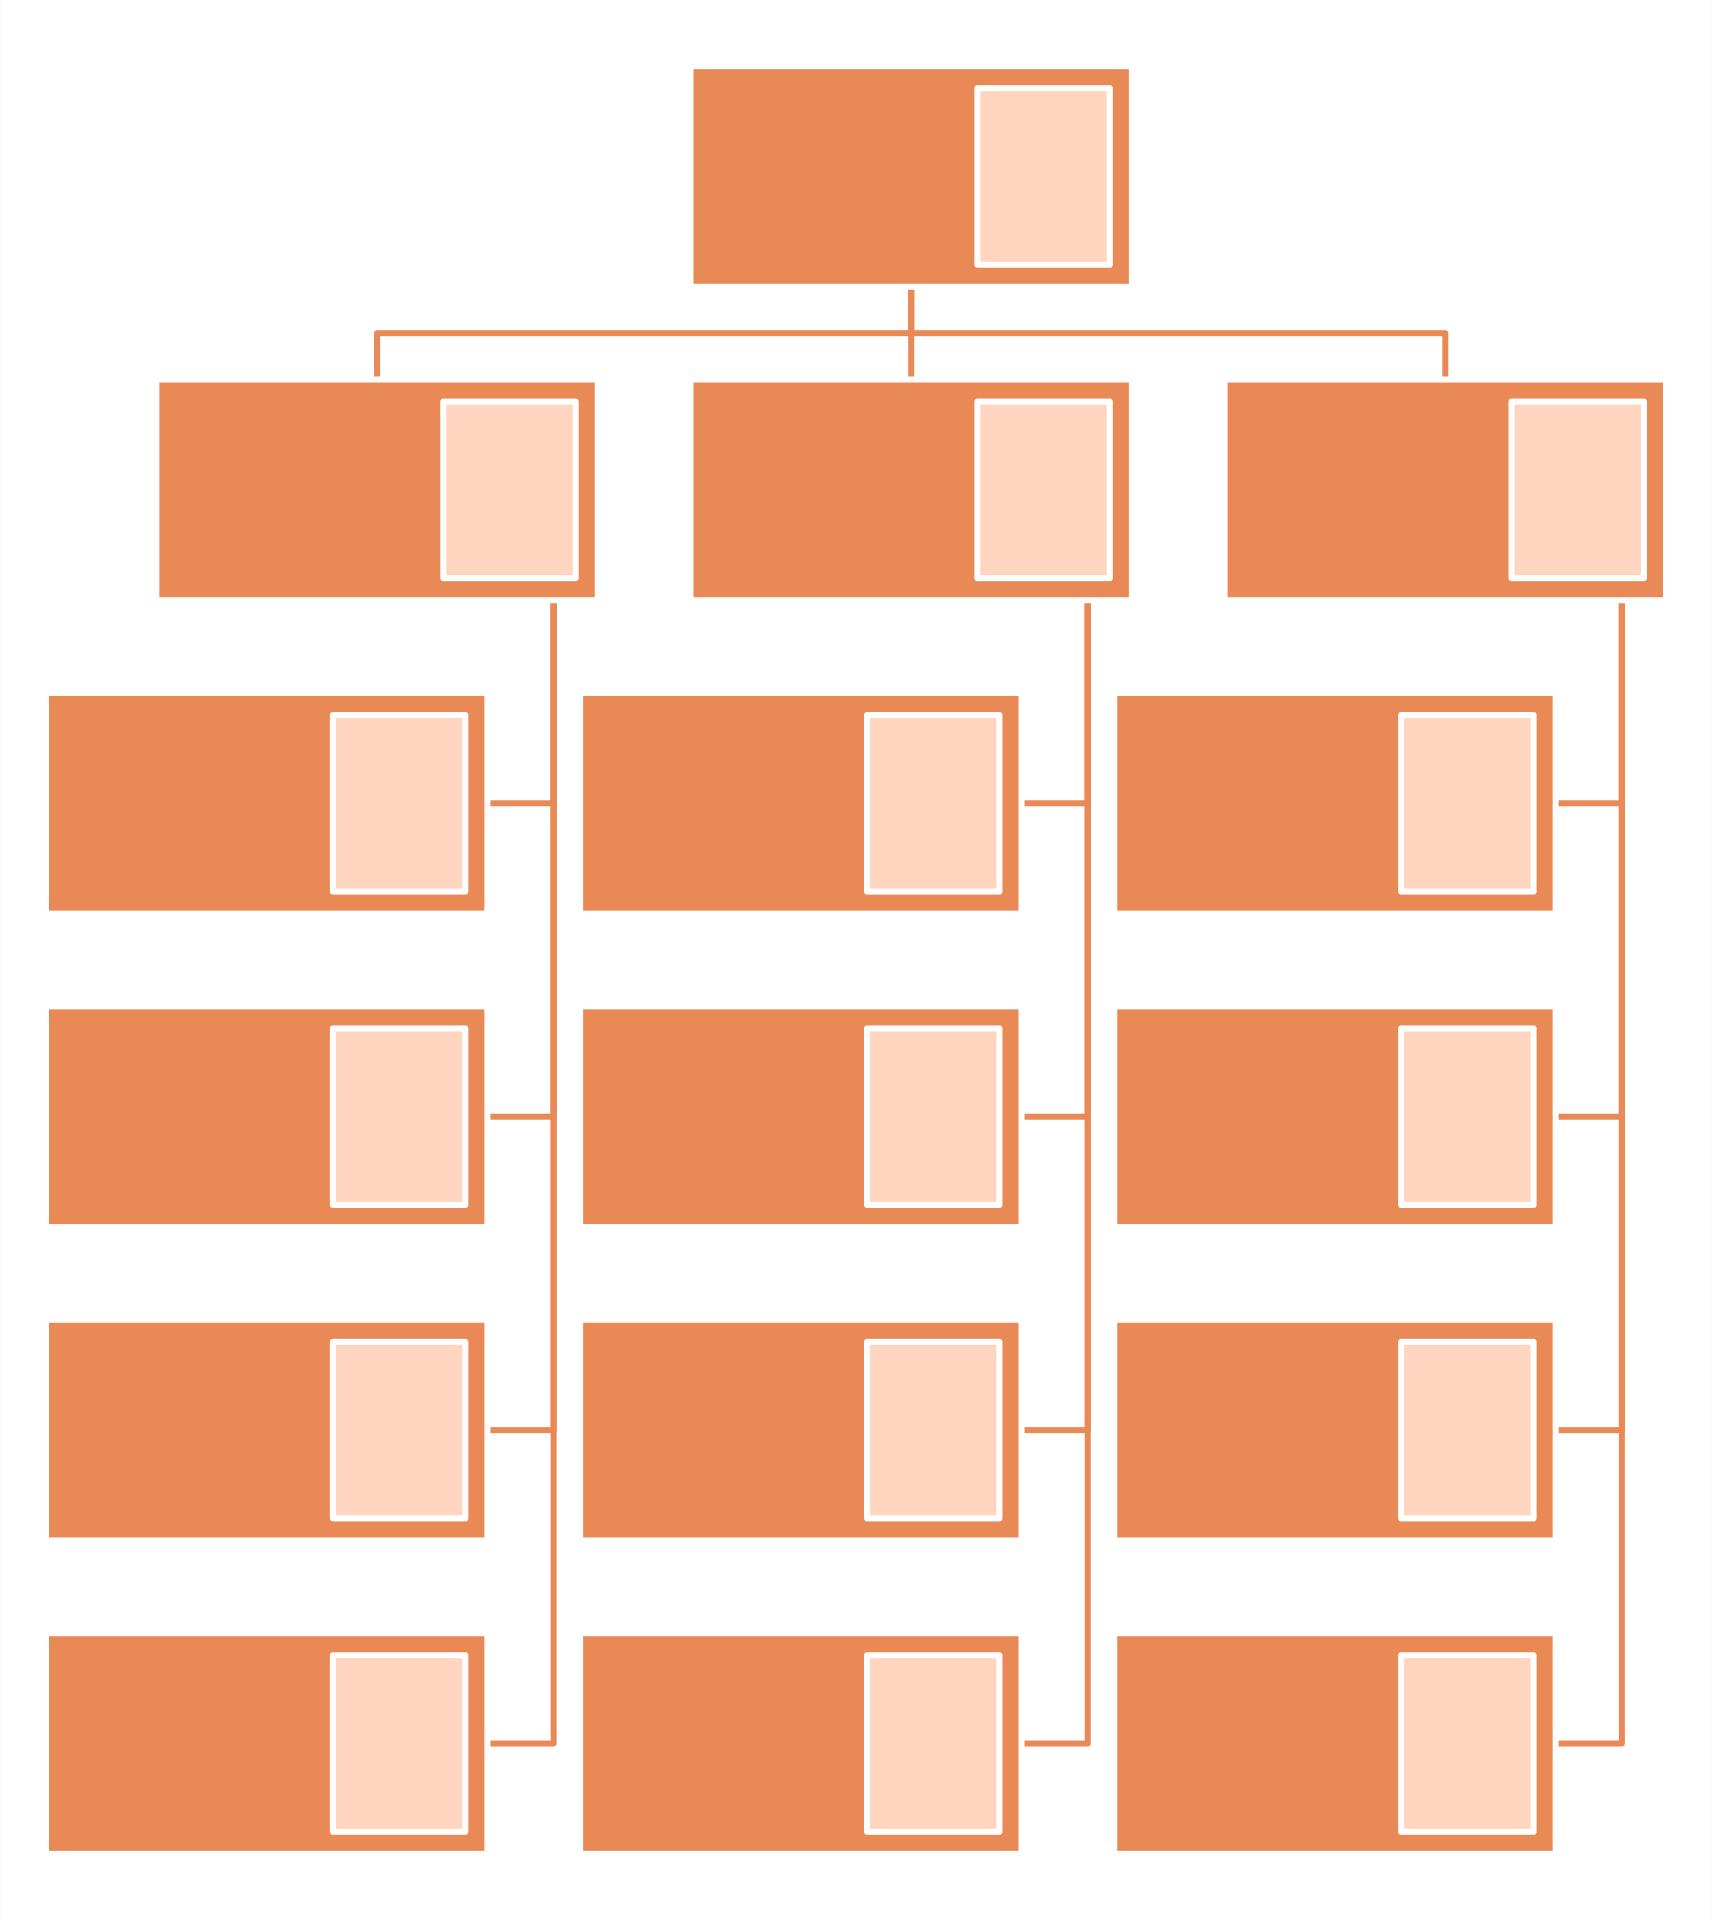 Blank Organizational Chart Template Printable